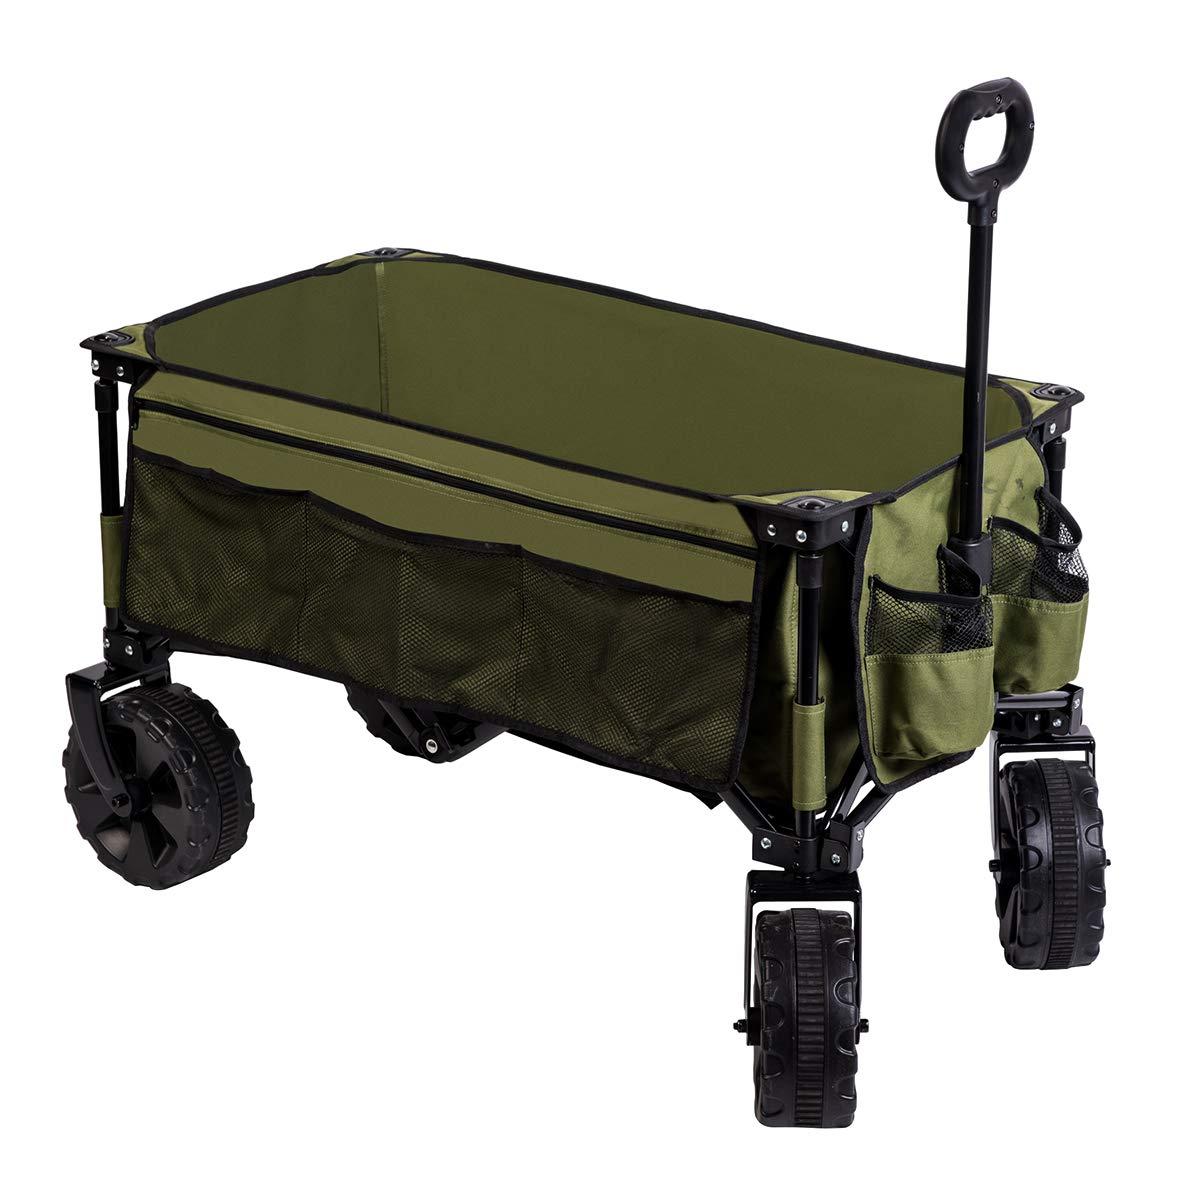 Timber Ridge Folding Camping Wagon/Cart - Collapsible Sturdy Steel Frame Garden/Beach Wagon/Cart Heavy Duty